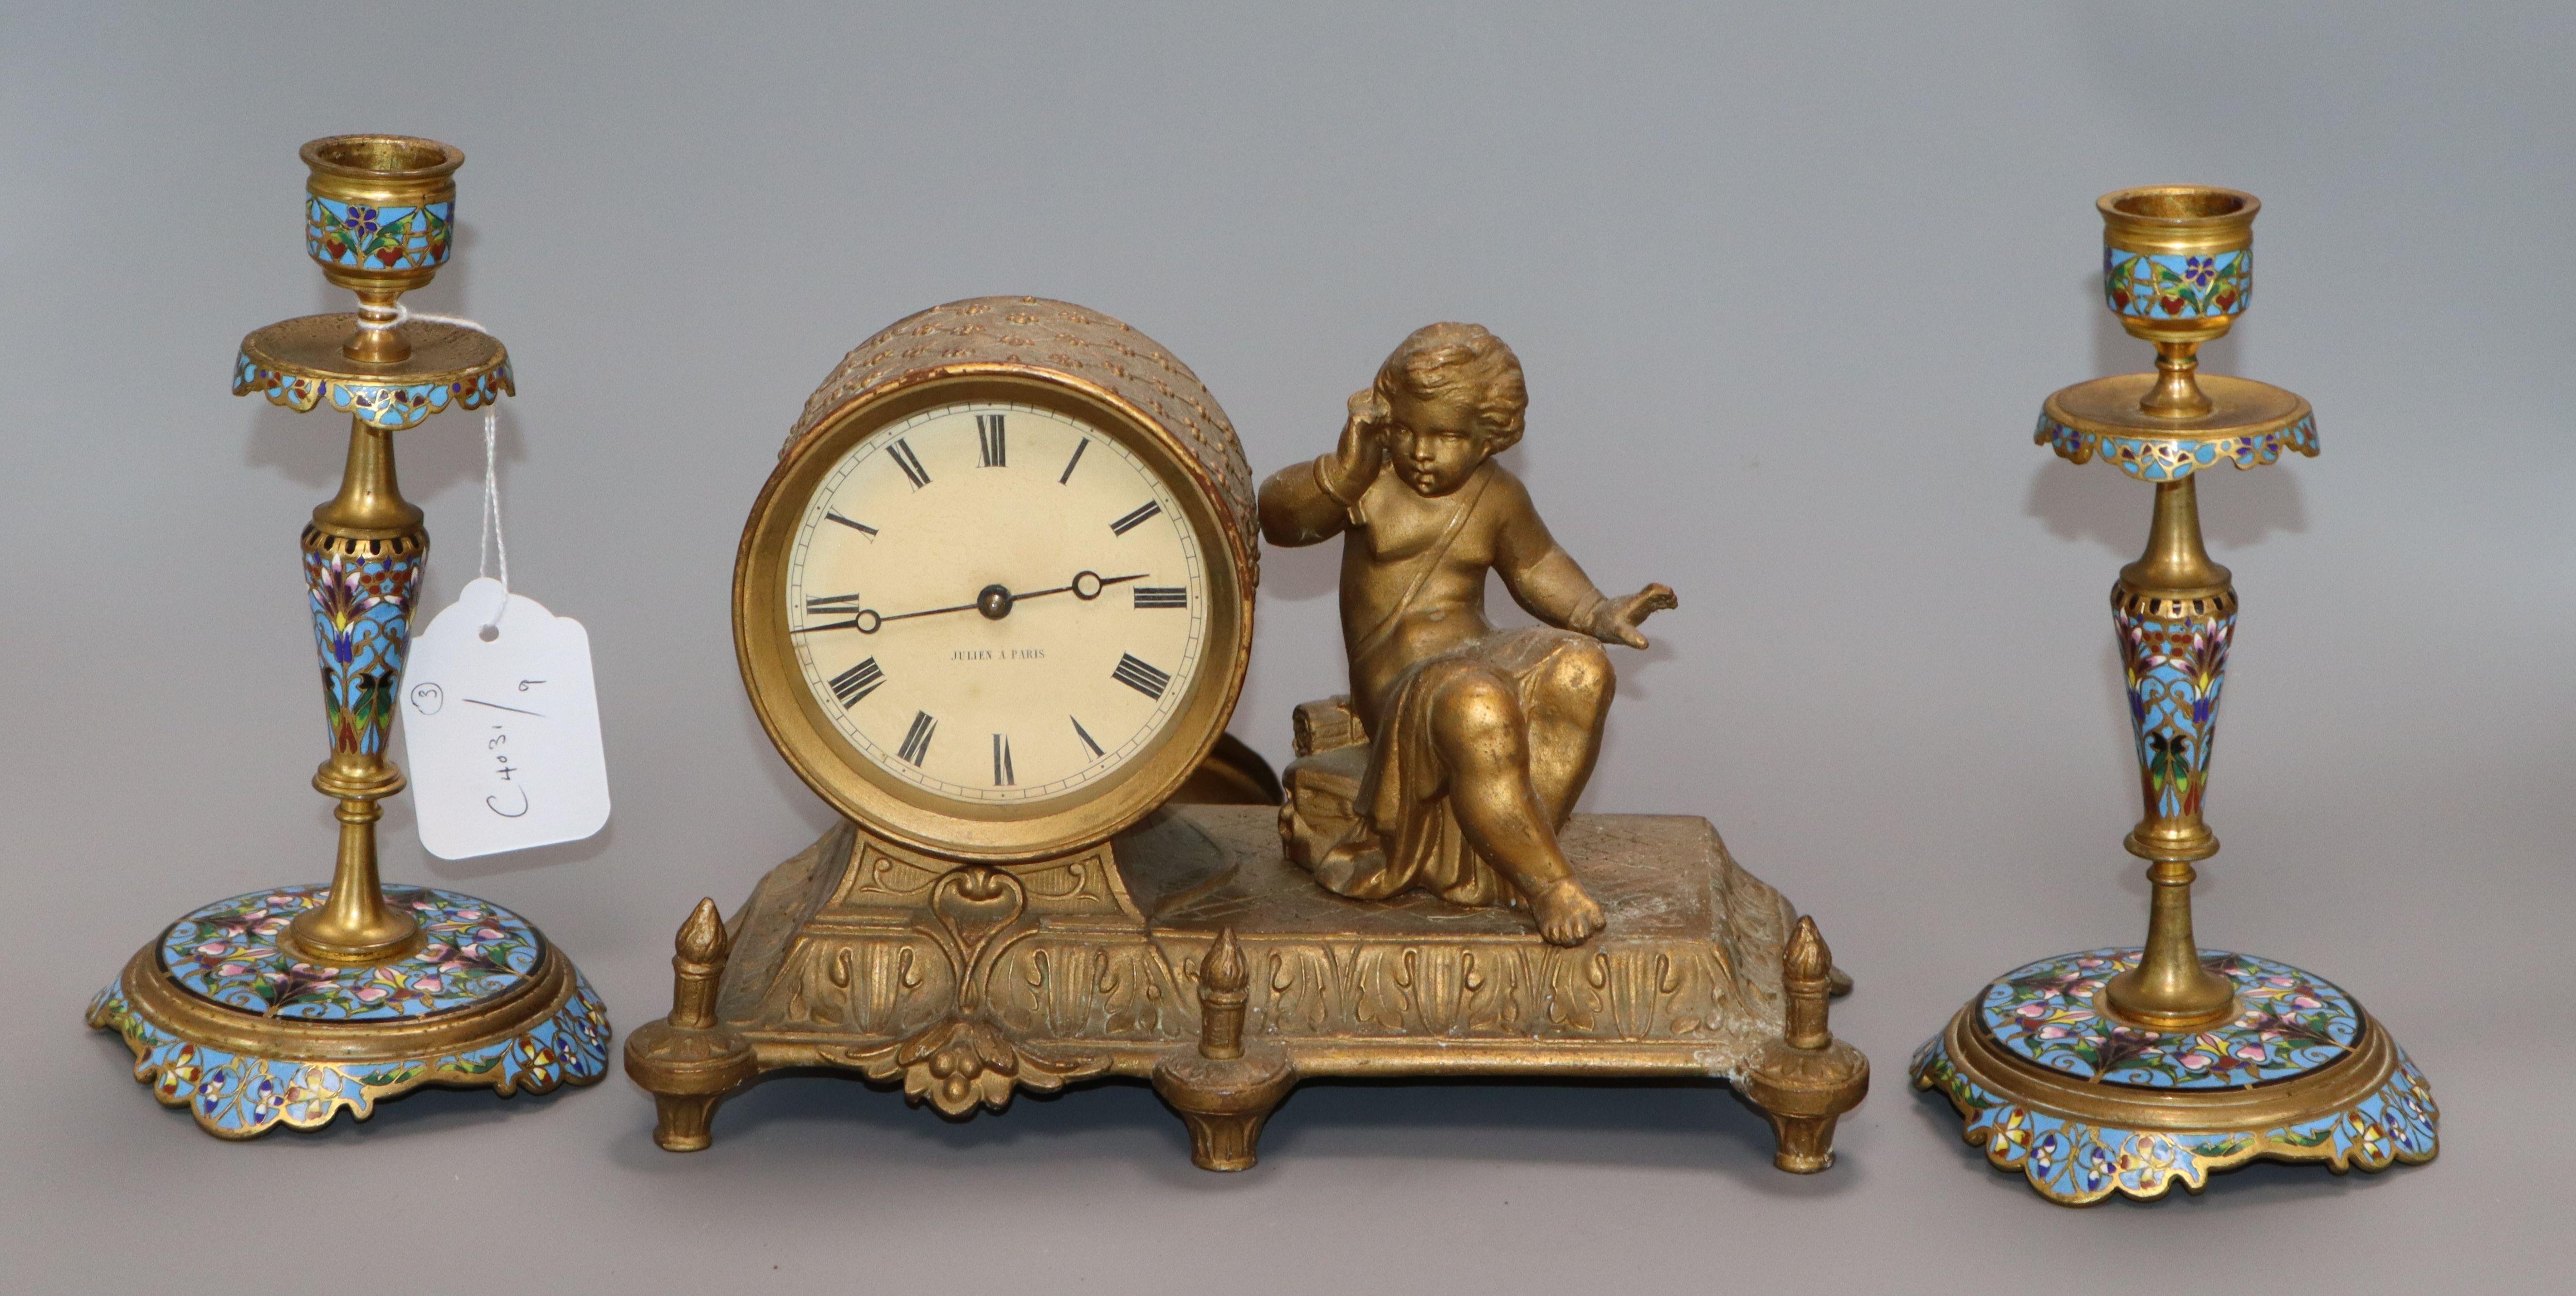 Lot 10 - A pair of champleve enamel candlesticks and a gilt mantel clock candlesticks 18cm